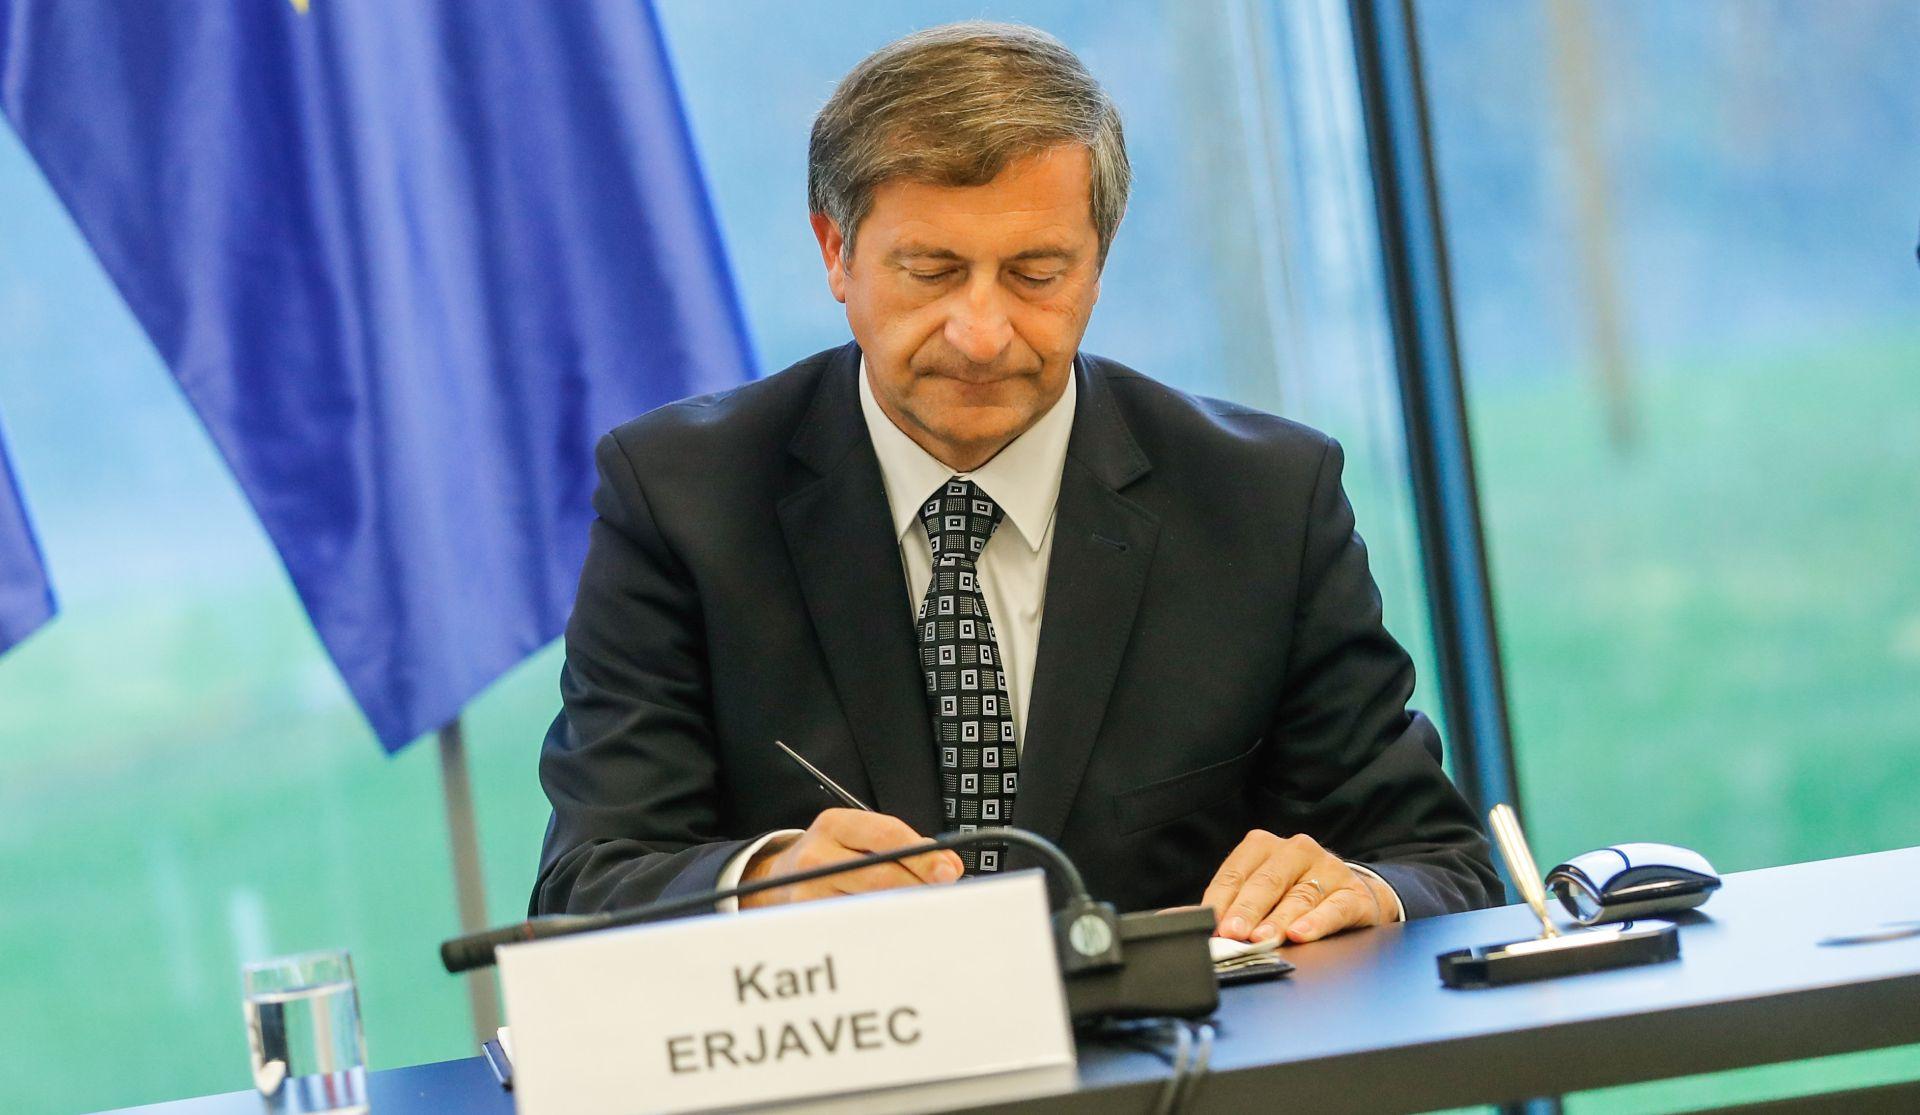 ERJAVEC 'Stanje na zapadnom Balkanu pogoršalo se'